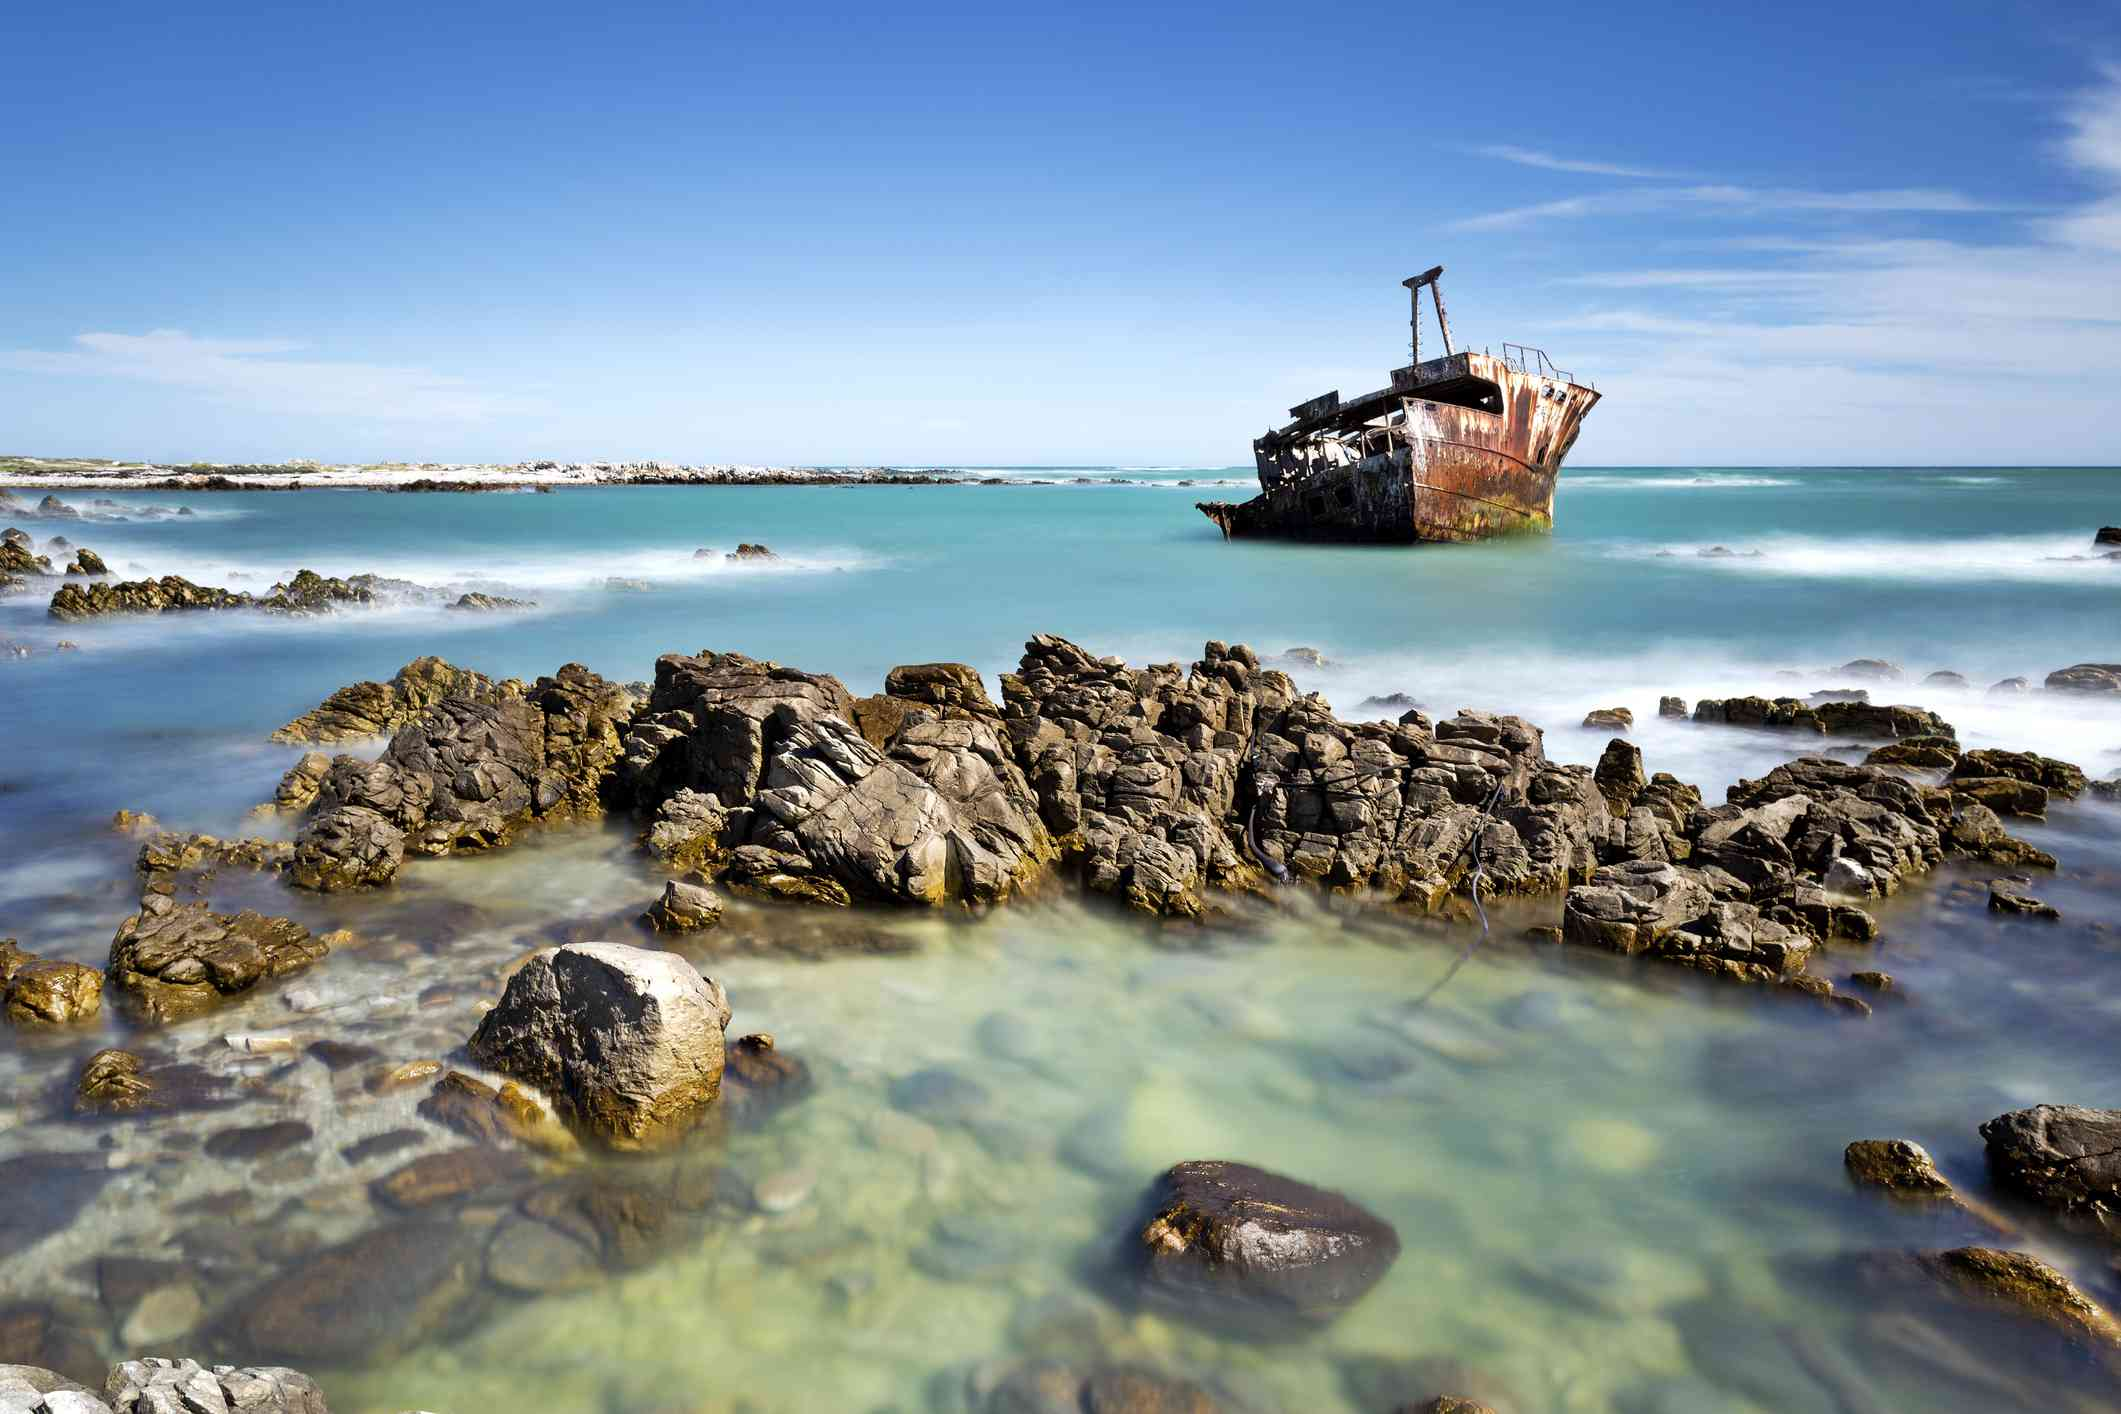 shipwreck off a rocky coast in Cape Agulhas